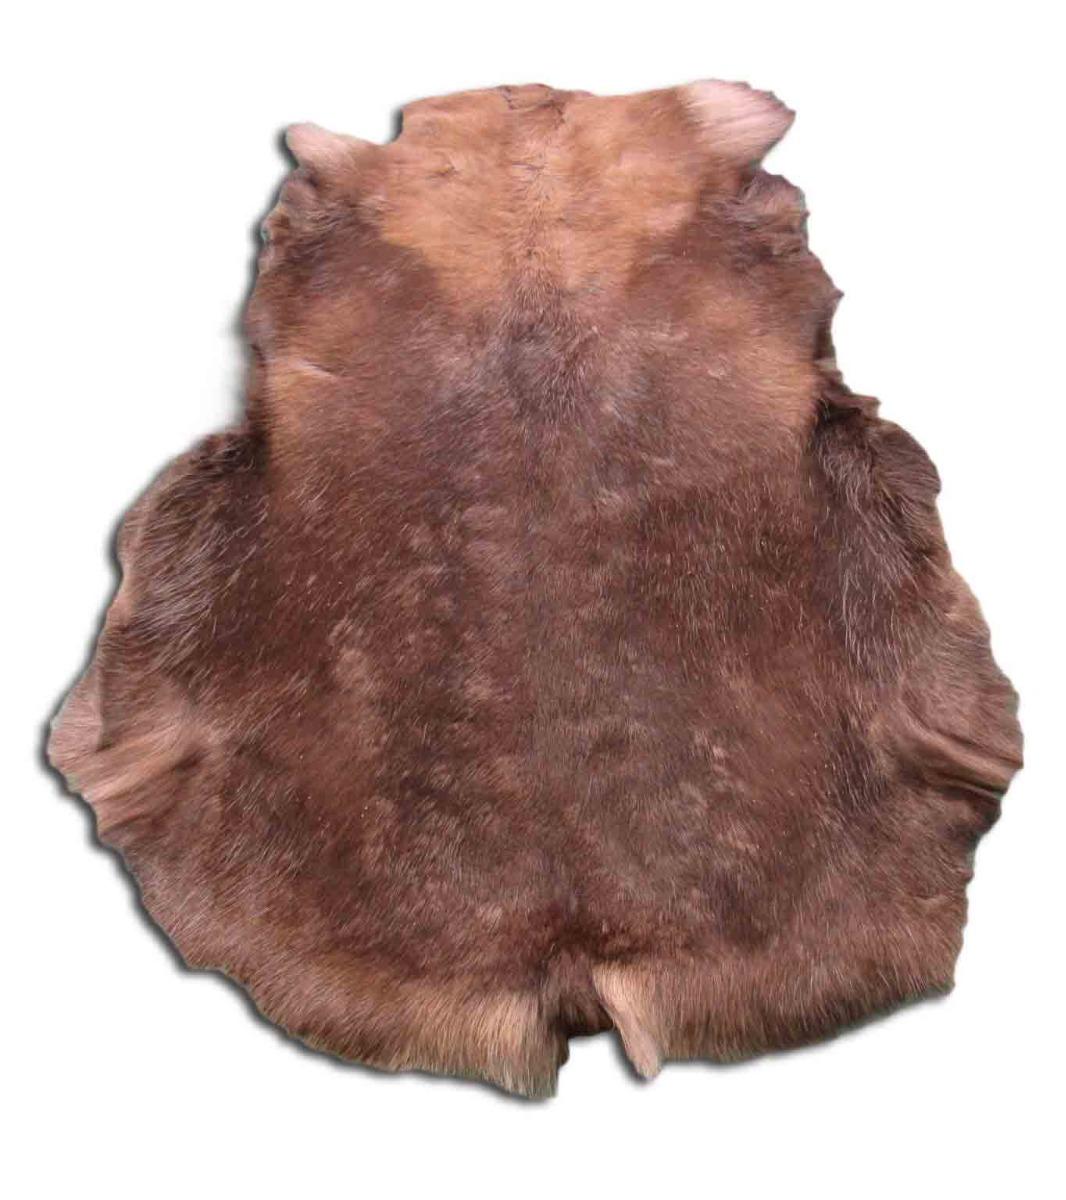 "A-1383 Reindeer Skin from Scandinavia Size: 49"" X 39"" Genuine Reindeer Skin"